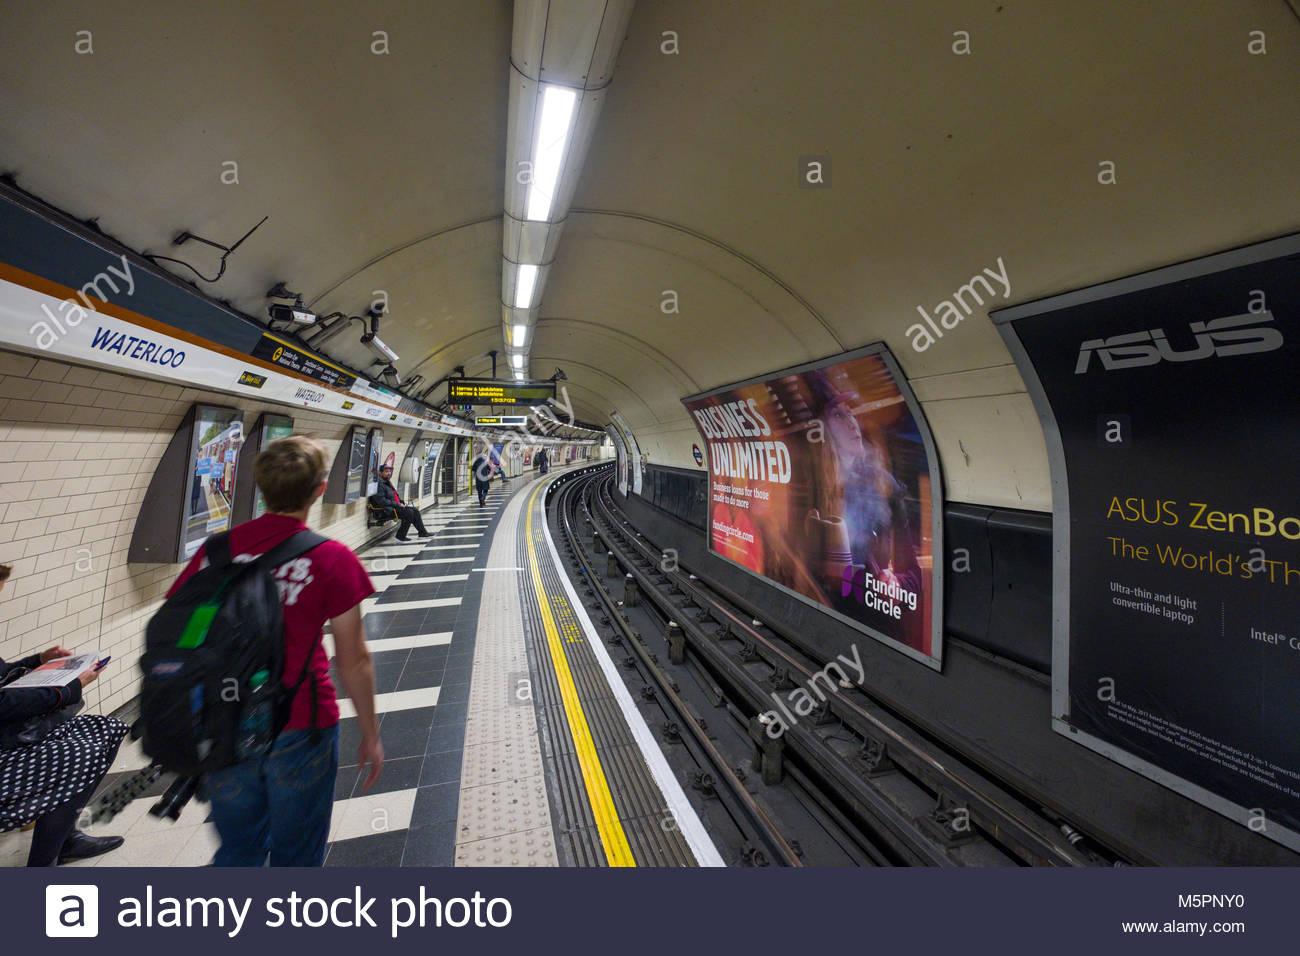 Train platform in Waterloo underground station, Lambeth, London, England, United Kingdom - Stock Image